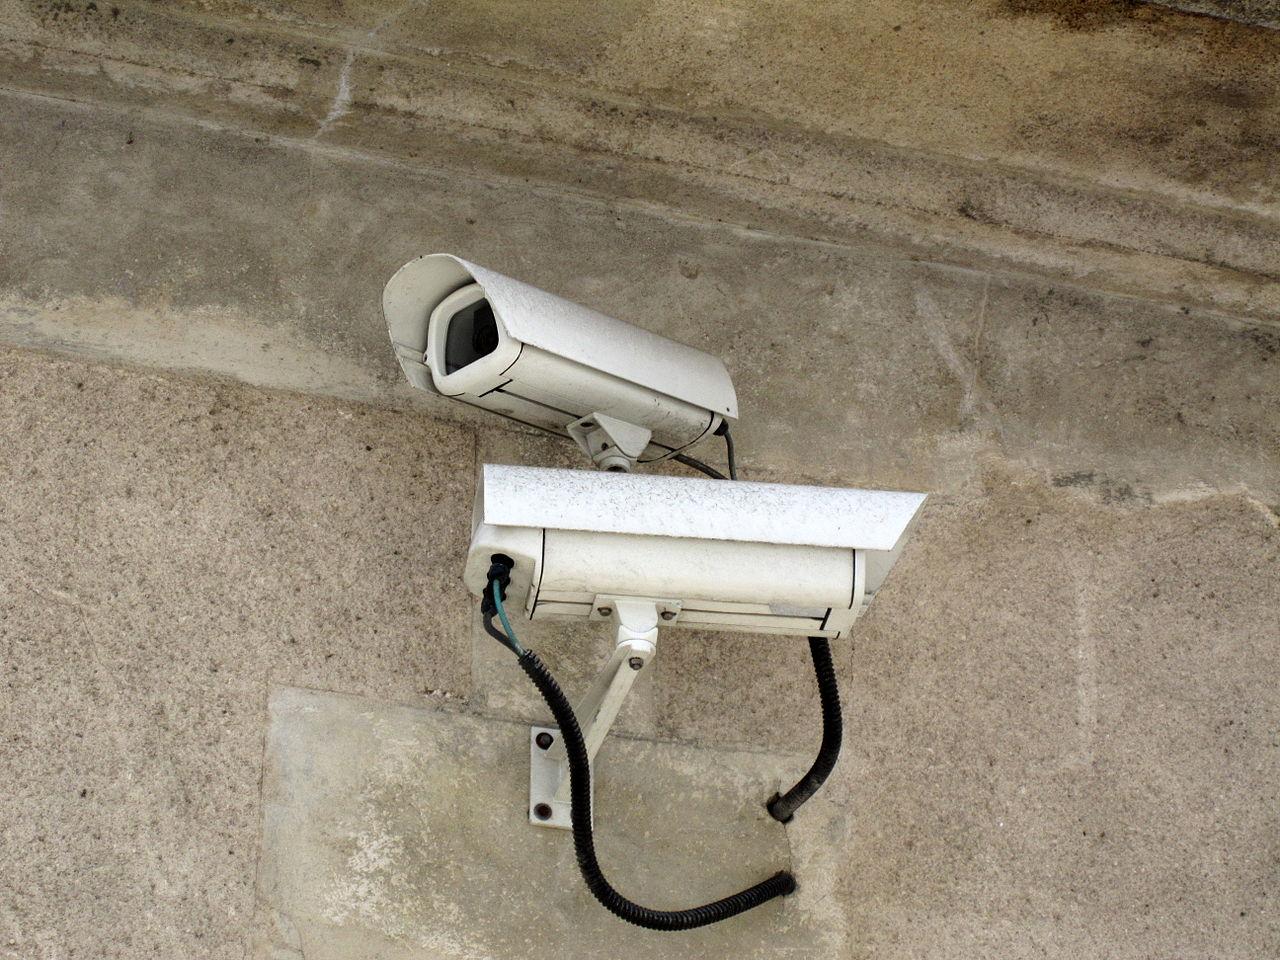 camera de surveillance petite